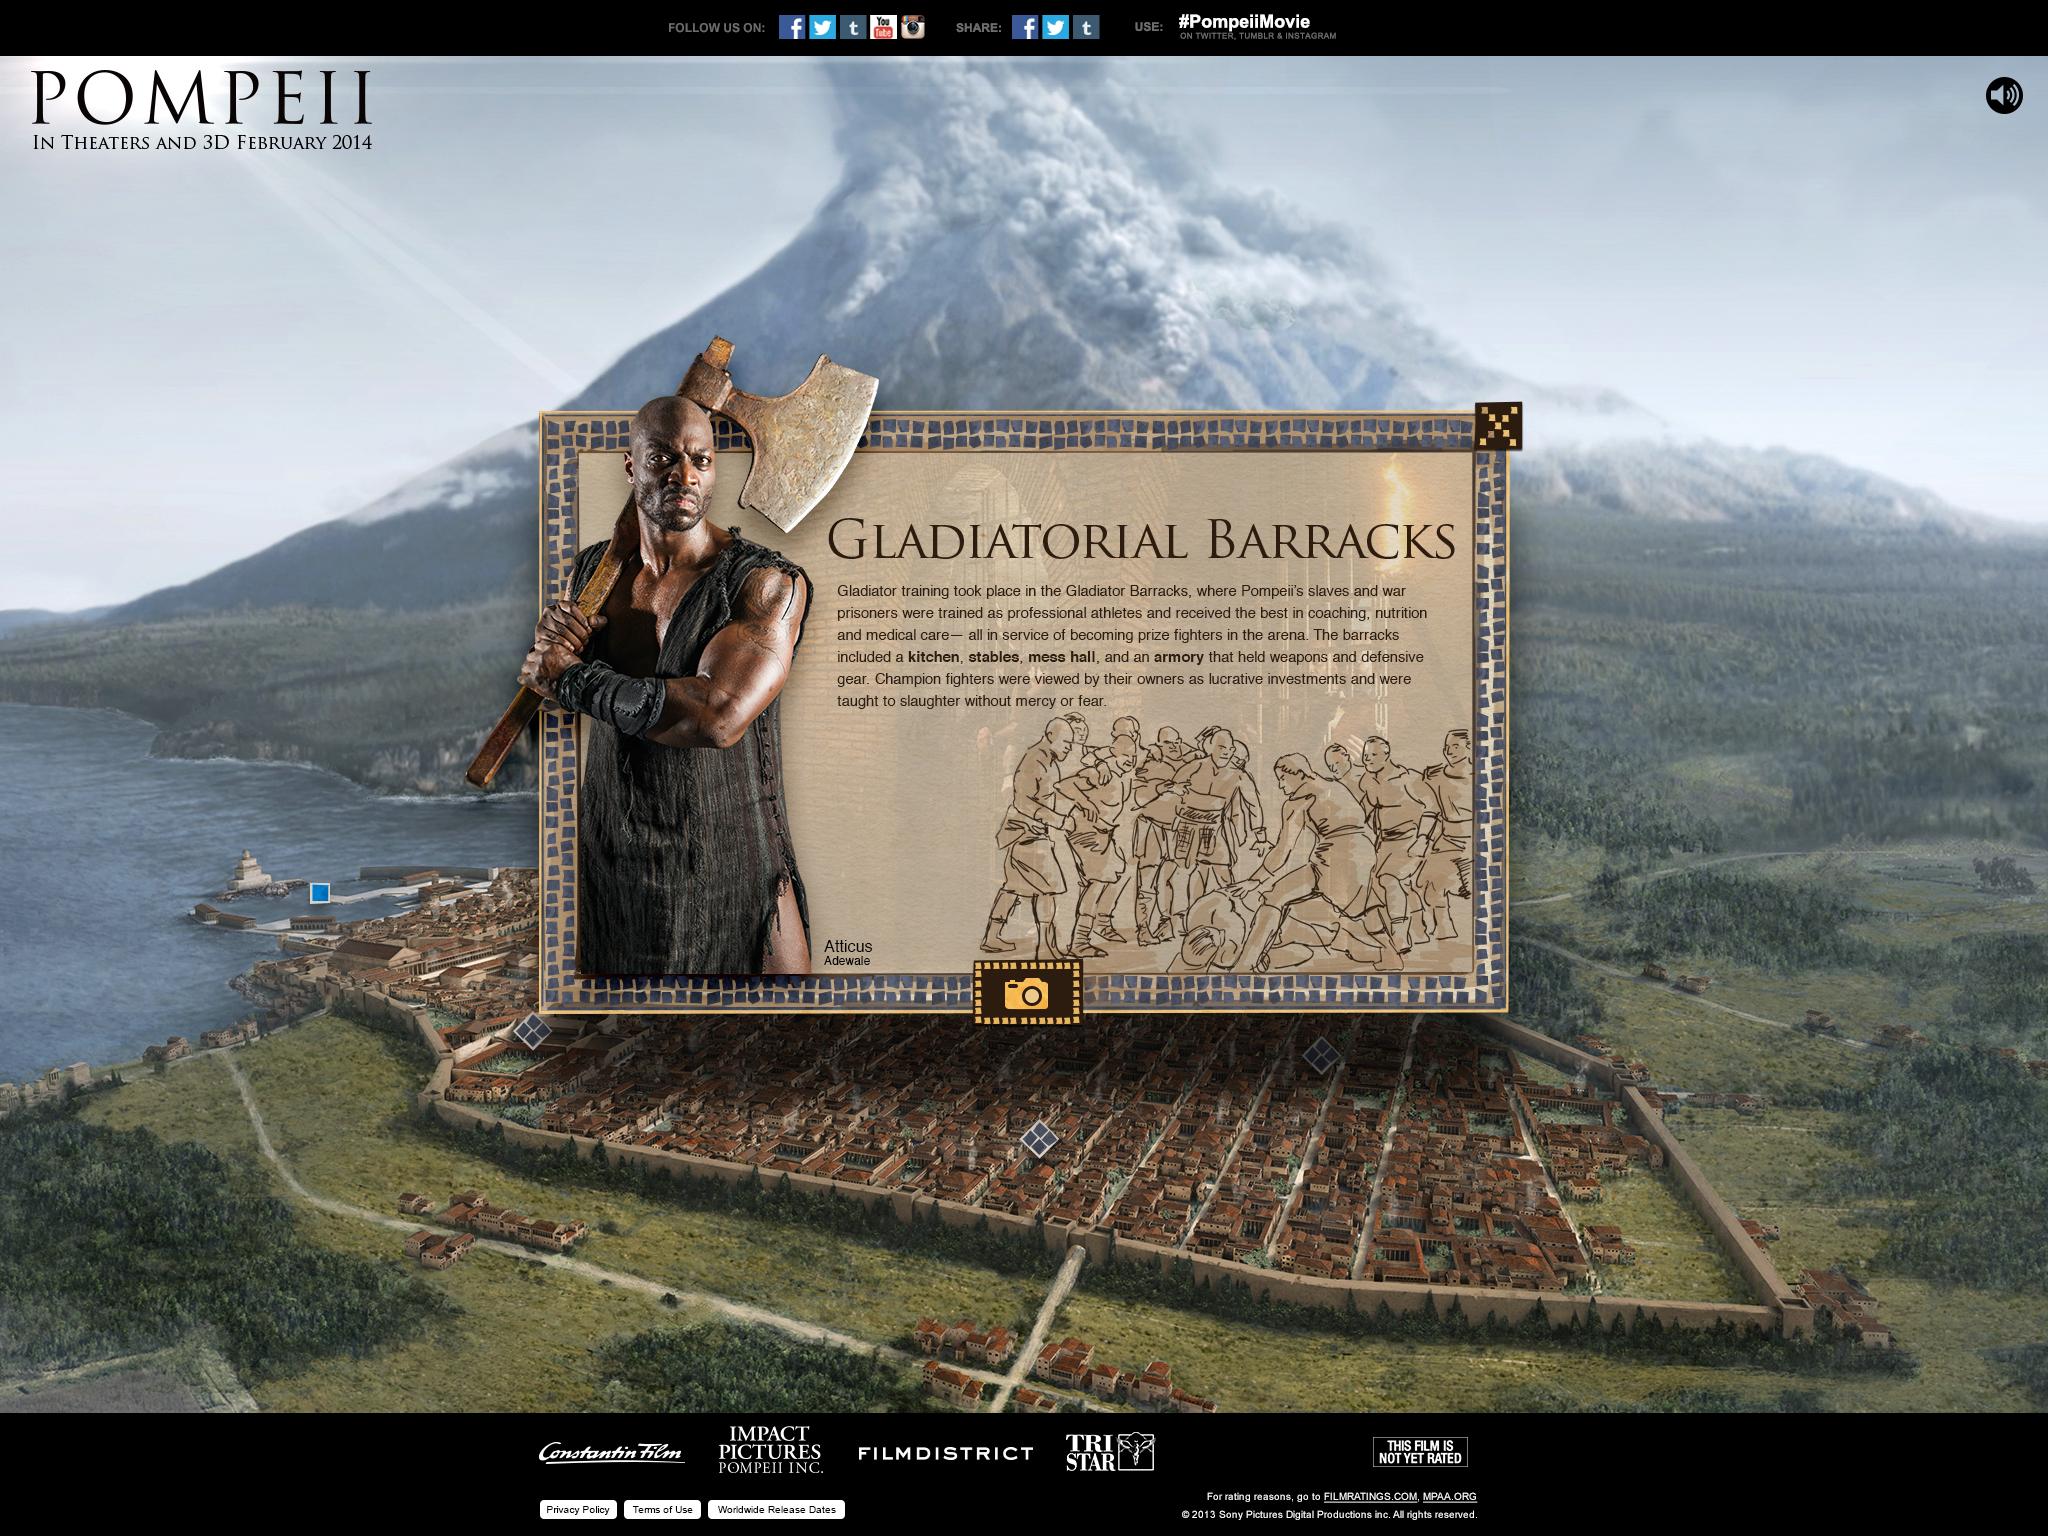 Pompeii_0004_gladitorial barracks info.jpg